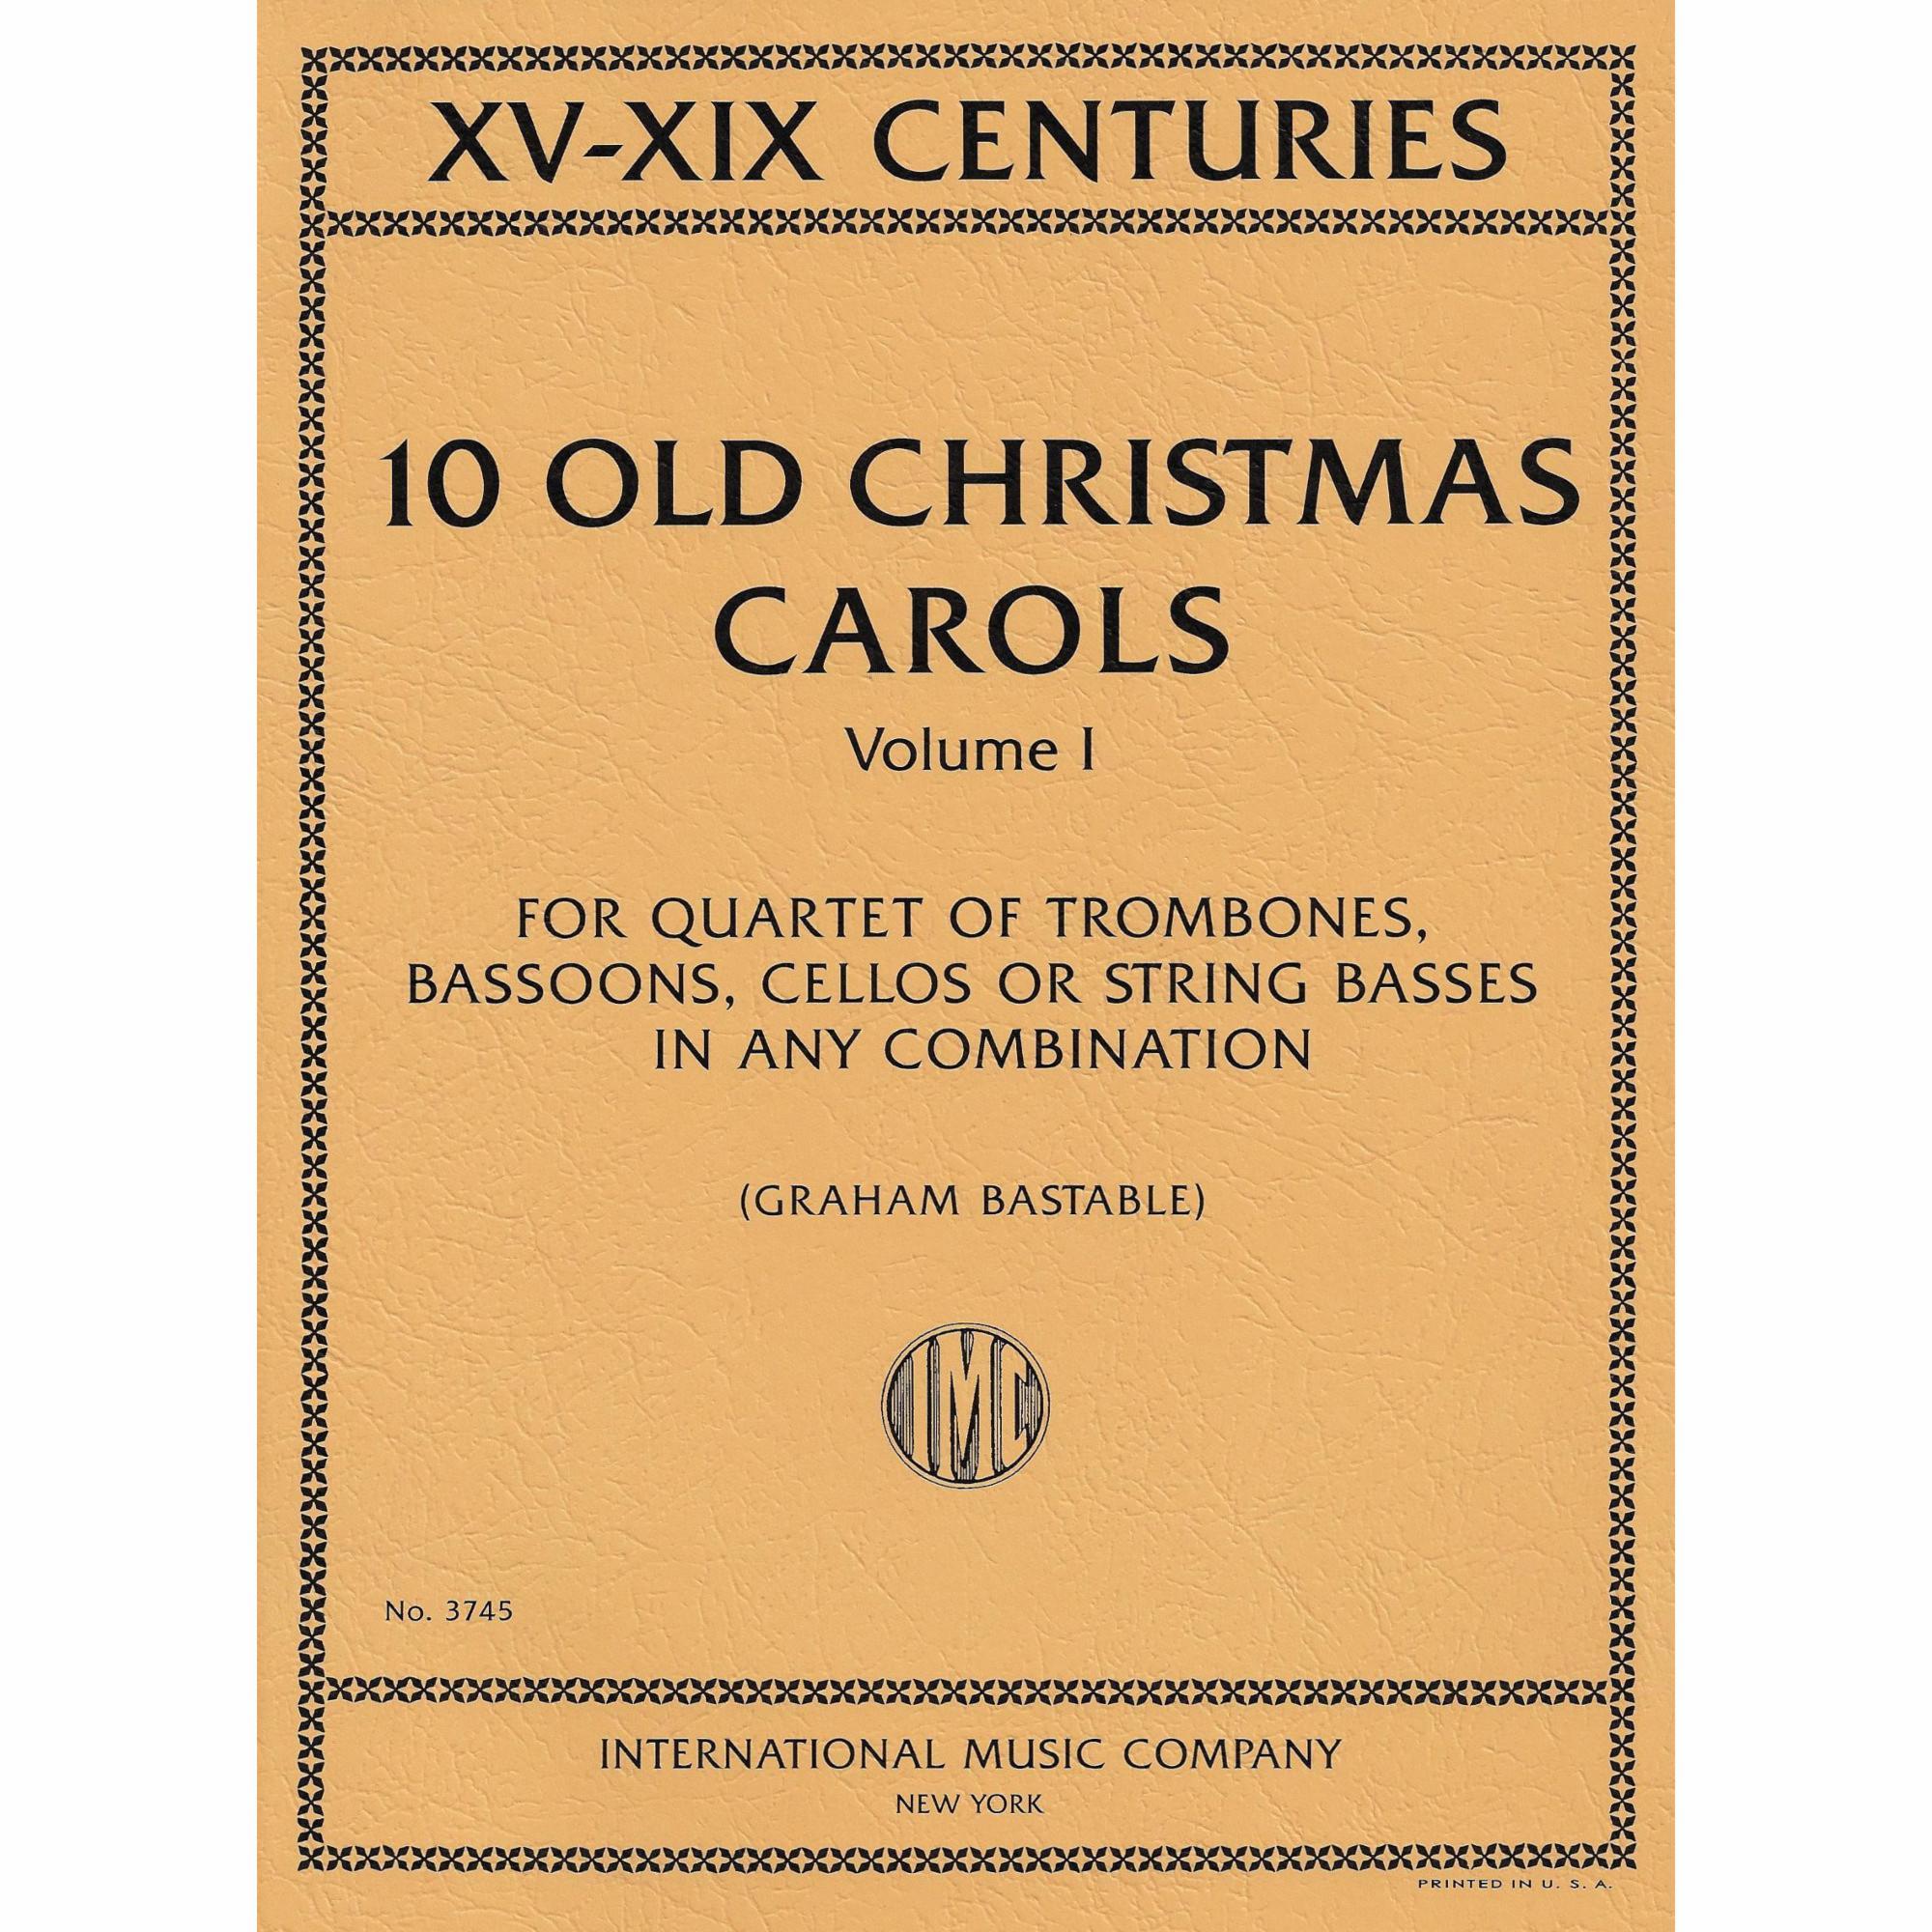 Ten Old Christmas Carols for Cellos | Southwest Strings